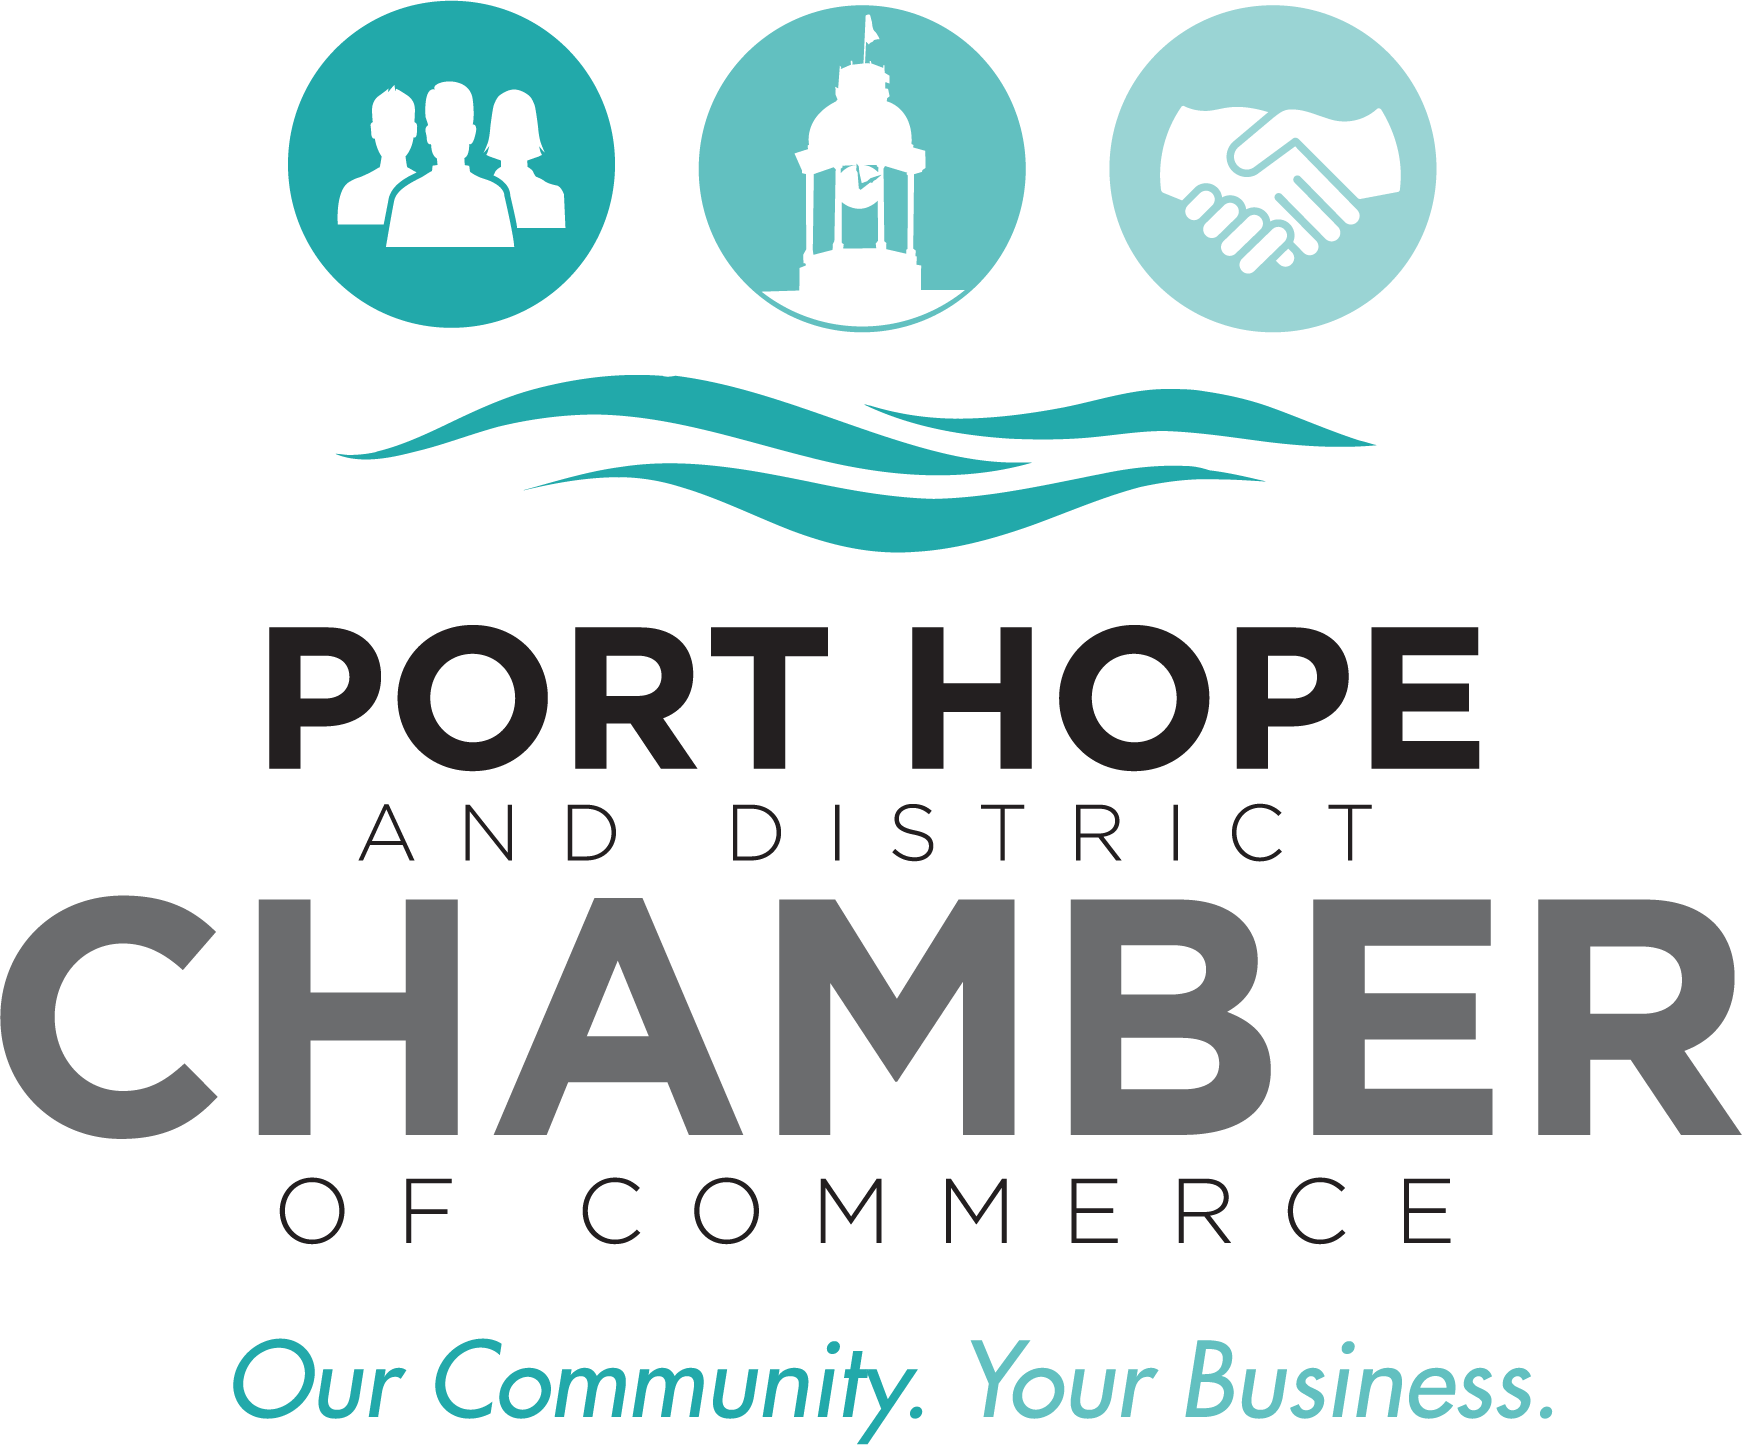 Port Hope & District Chamber of Commerce logo